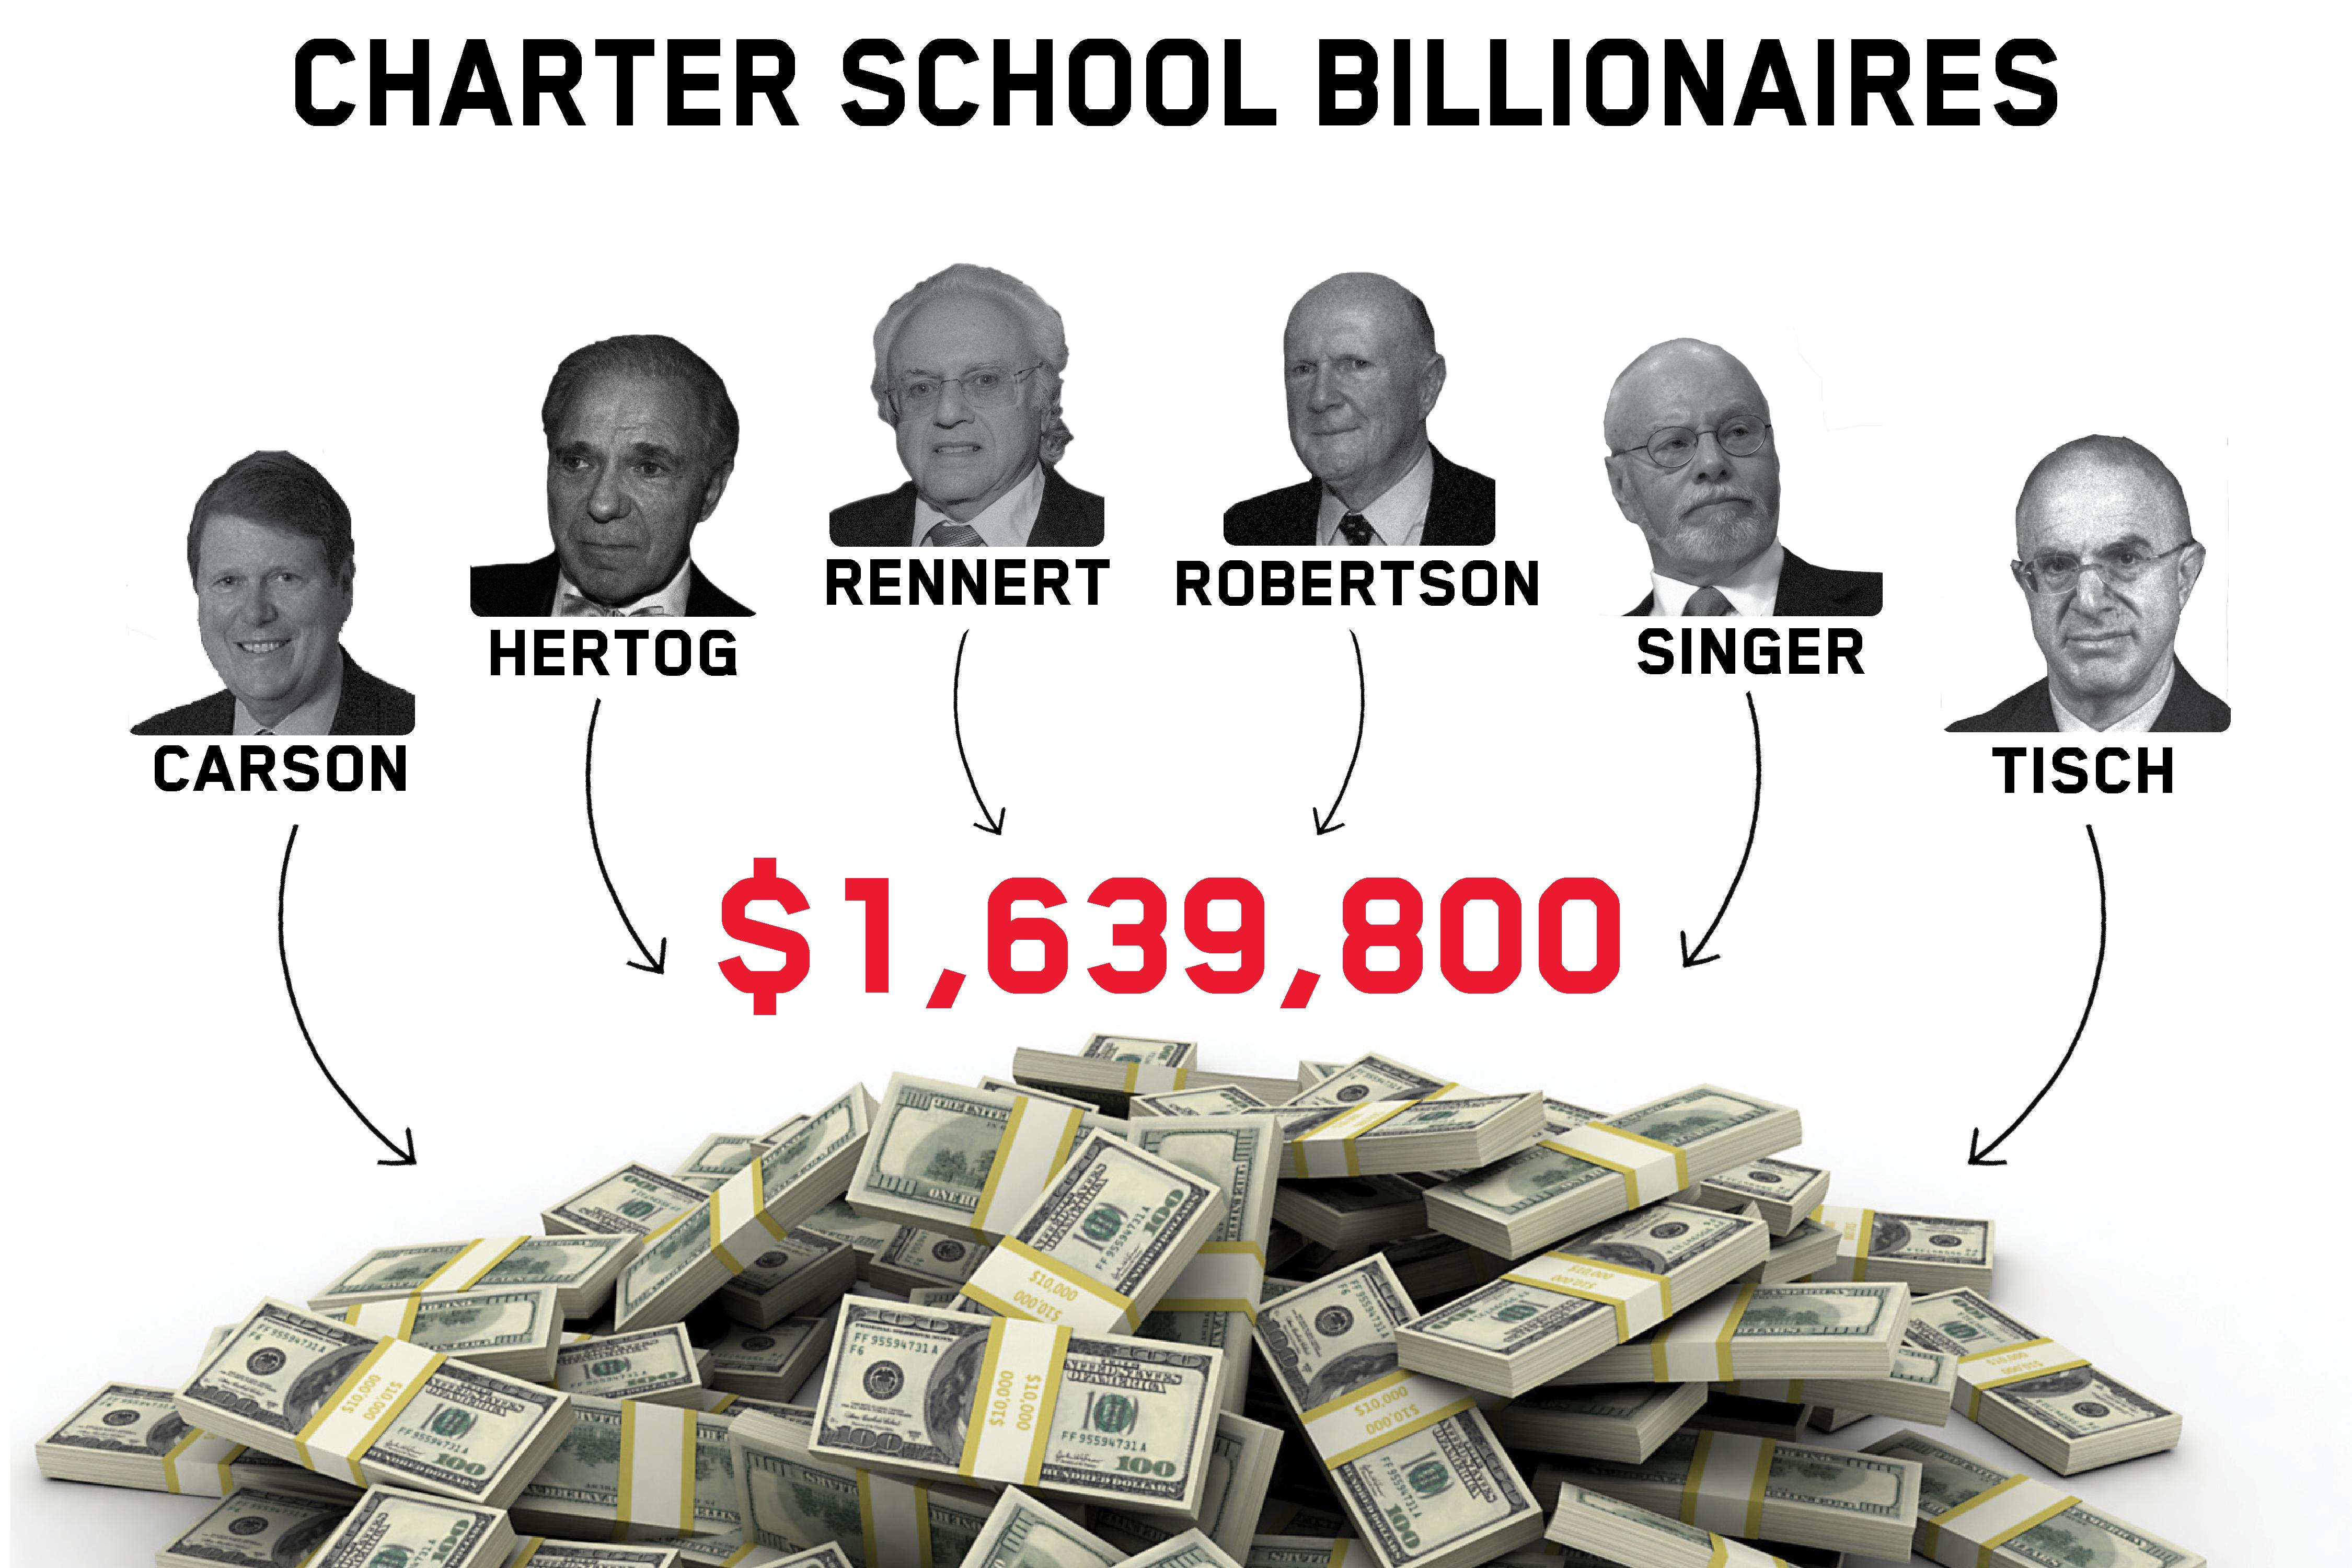 Charter school donor diagram - Web